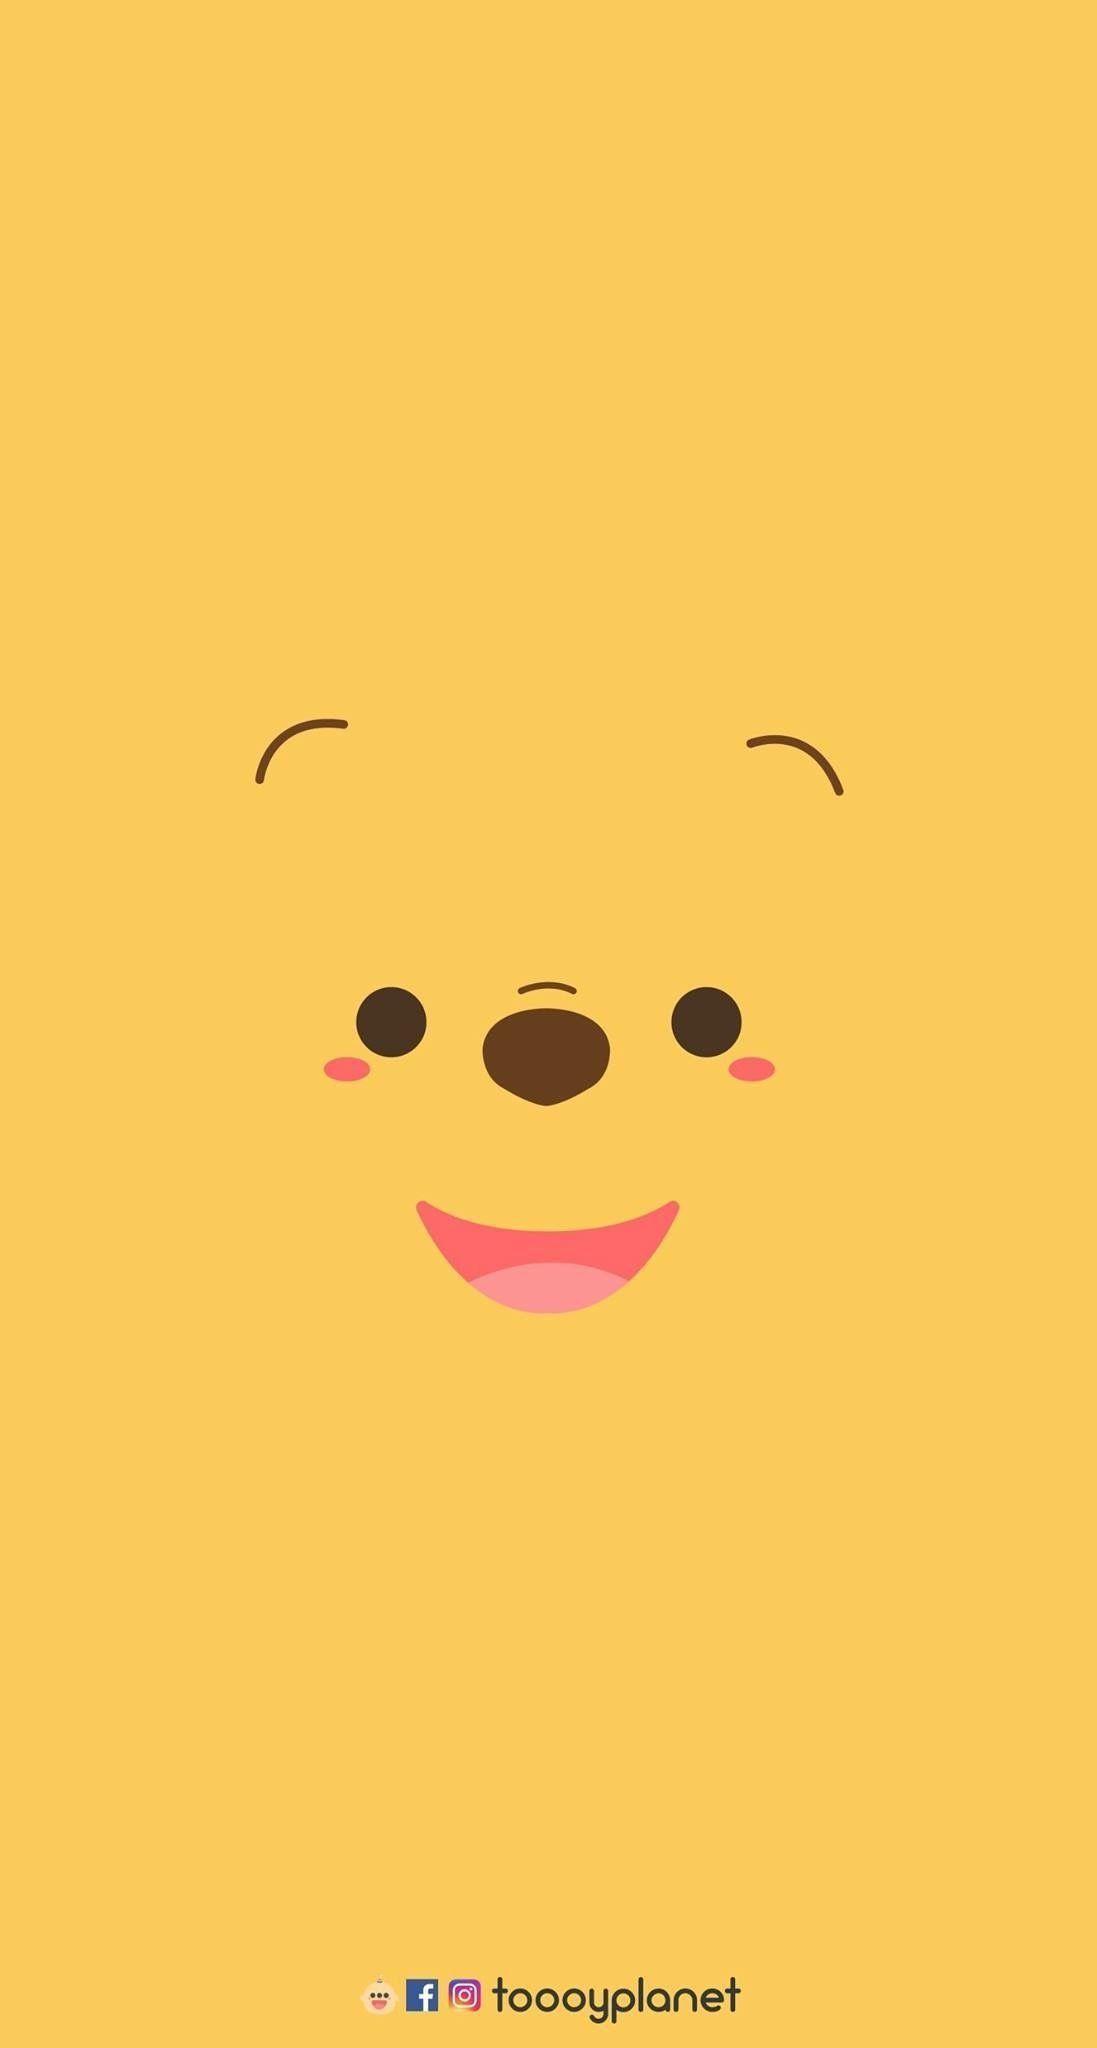 Winnie The Pooh Iphone Wallpapers Top Free Winnie The Pooh Throughout Winnie The Pooh Iphone Wallpaper Lukisan Disney Ilustrator Poster Abstrak